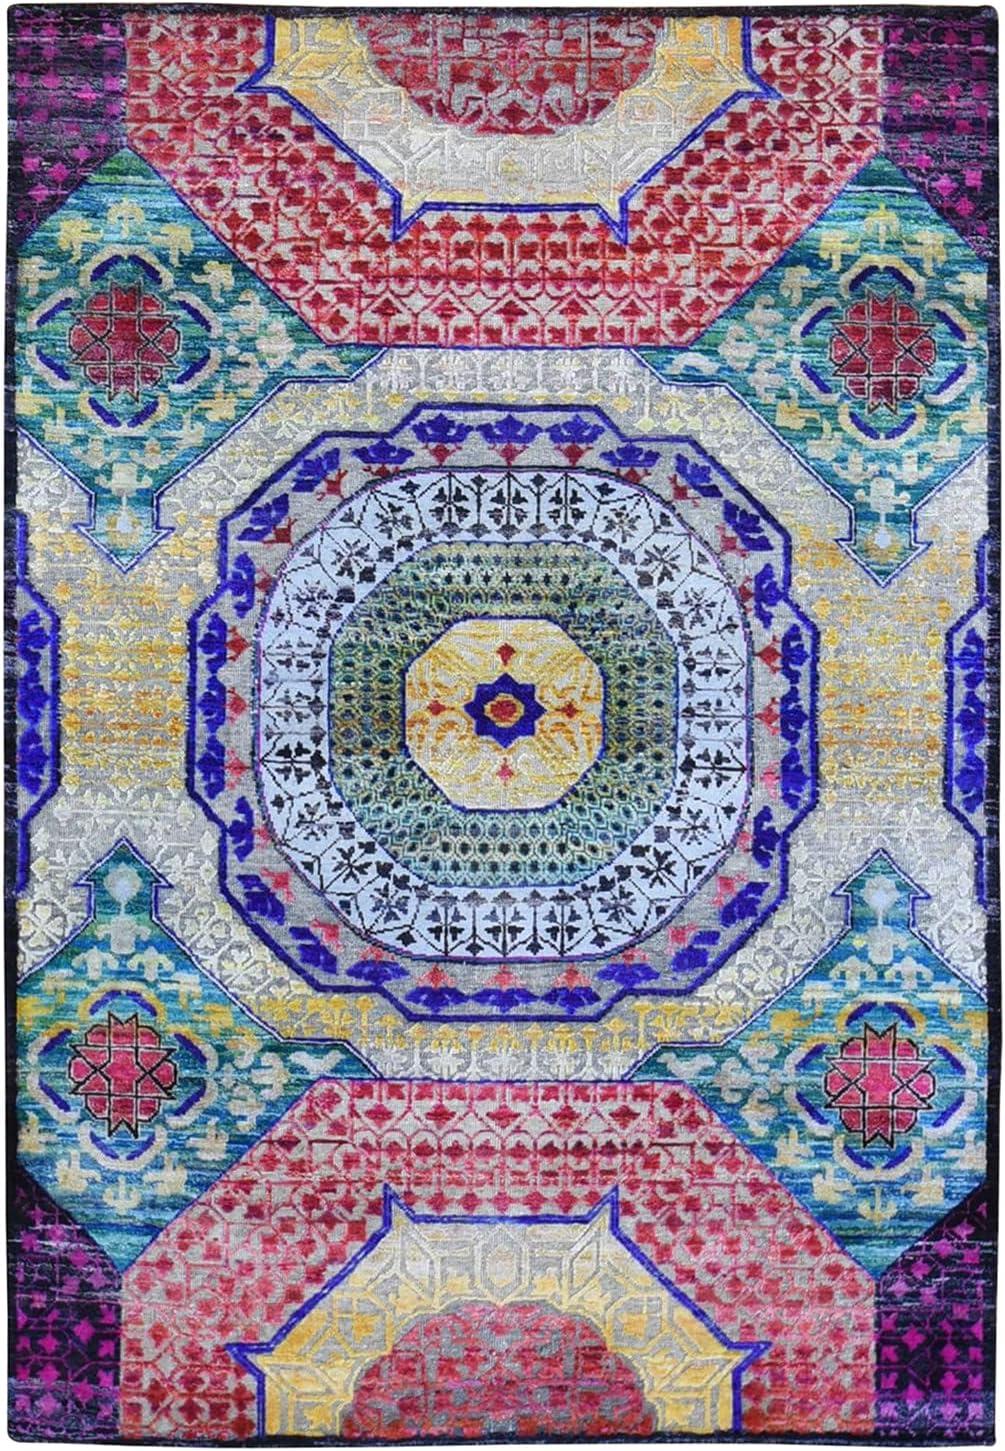 Shahbanu Rugs Sari New Orleans Mall Silk Large discharge sale with Wool Textured Colorfu Design Mamluk